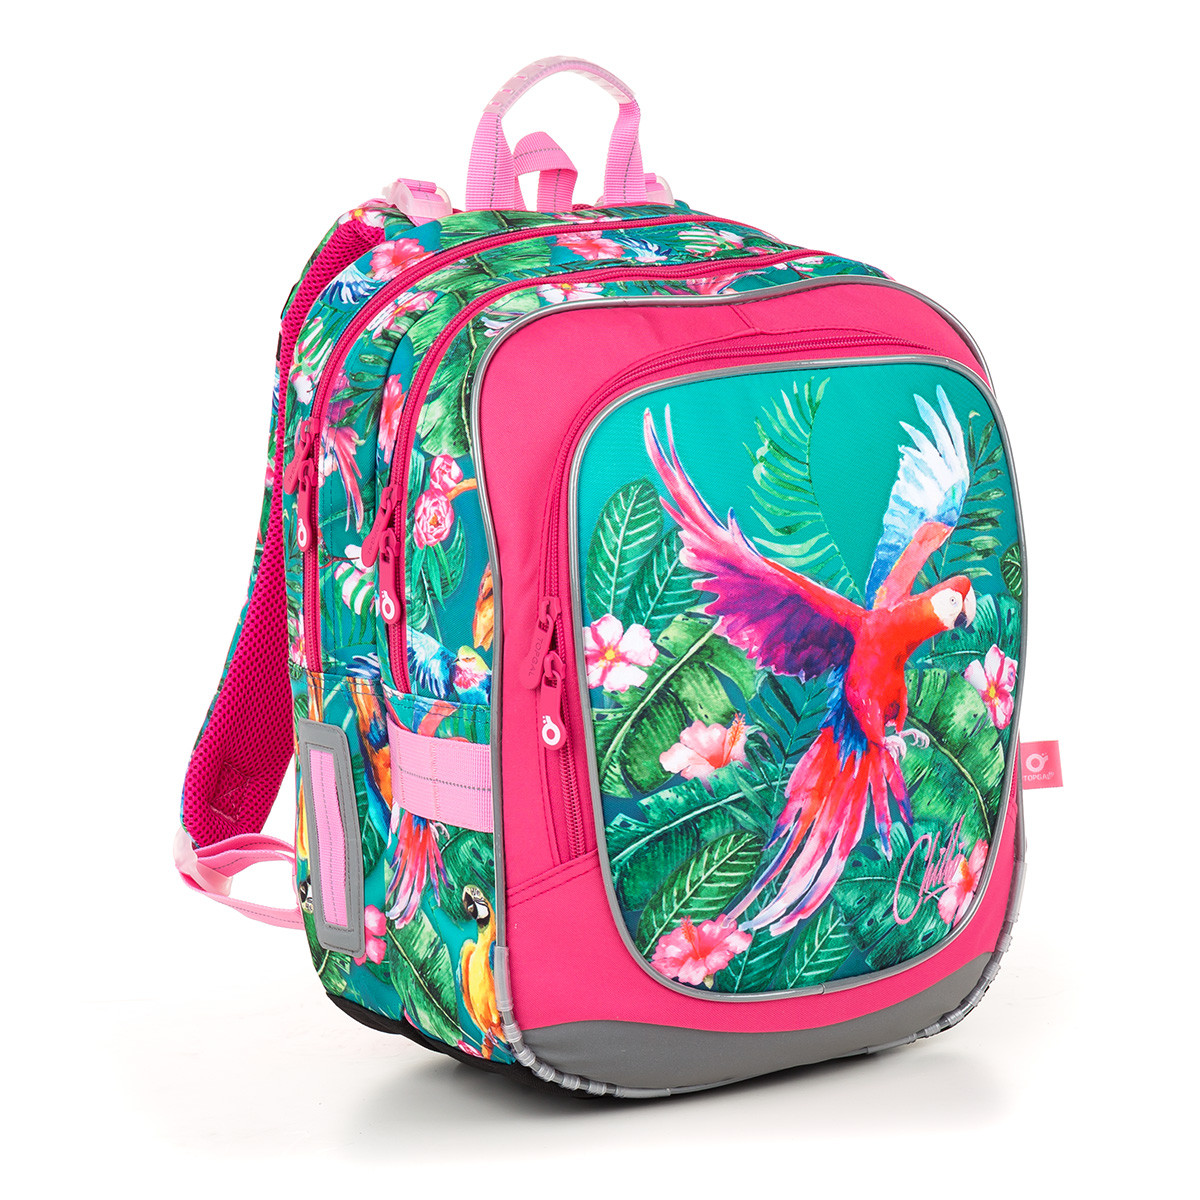 Školní batoh Topgal ENDY 18001  9d81f0f8e9